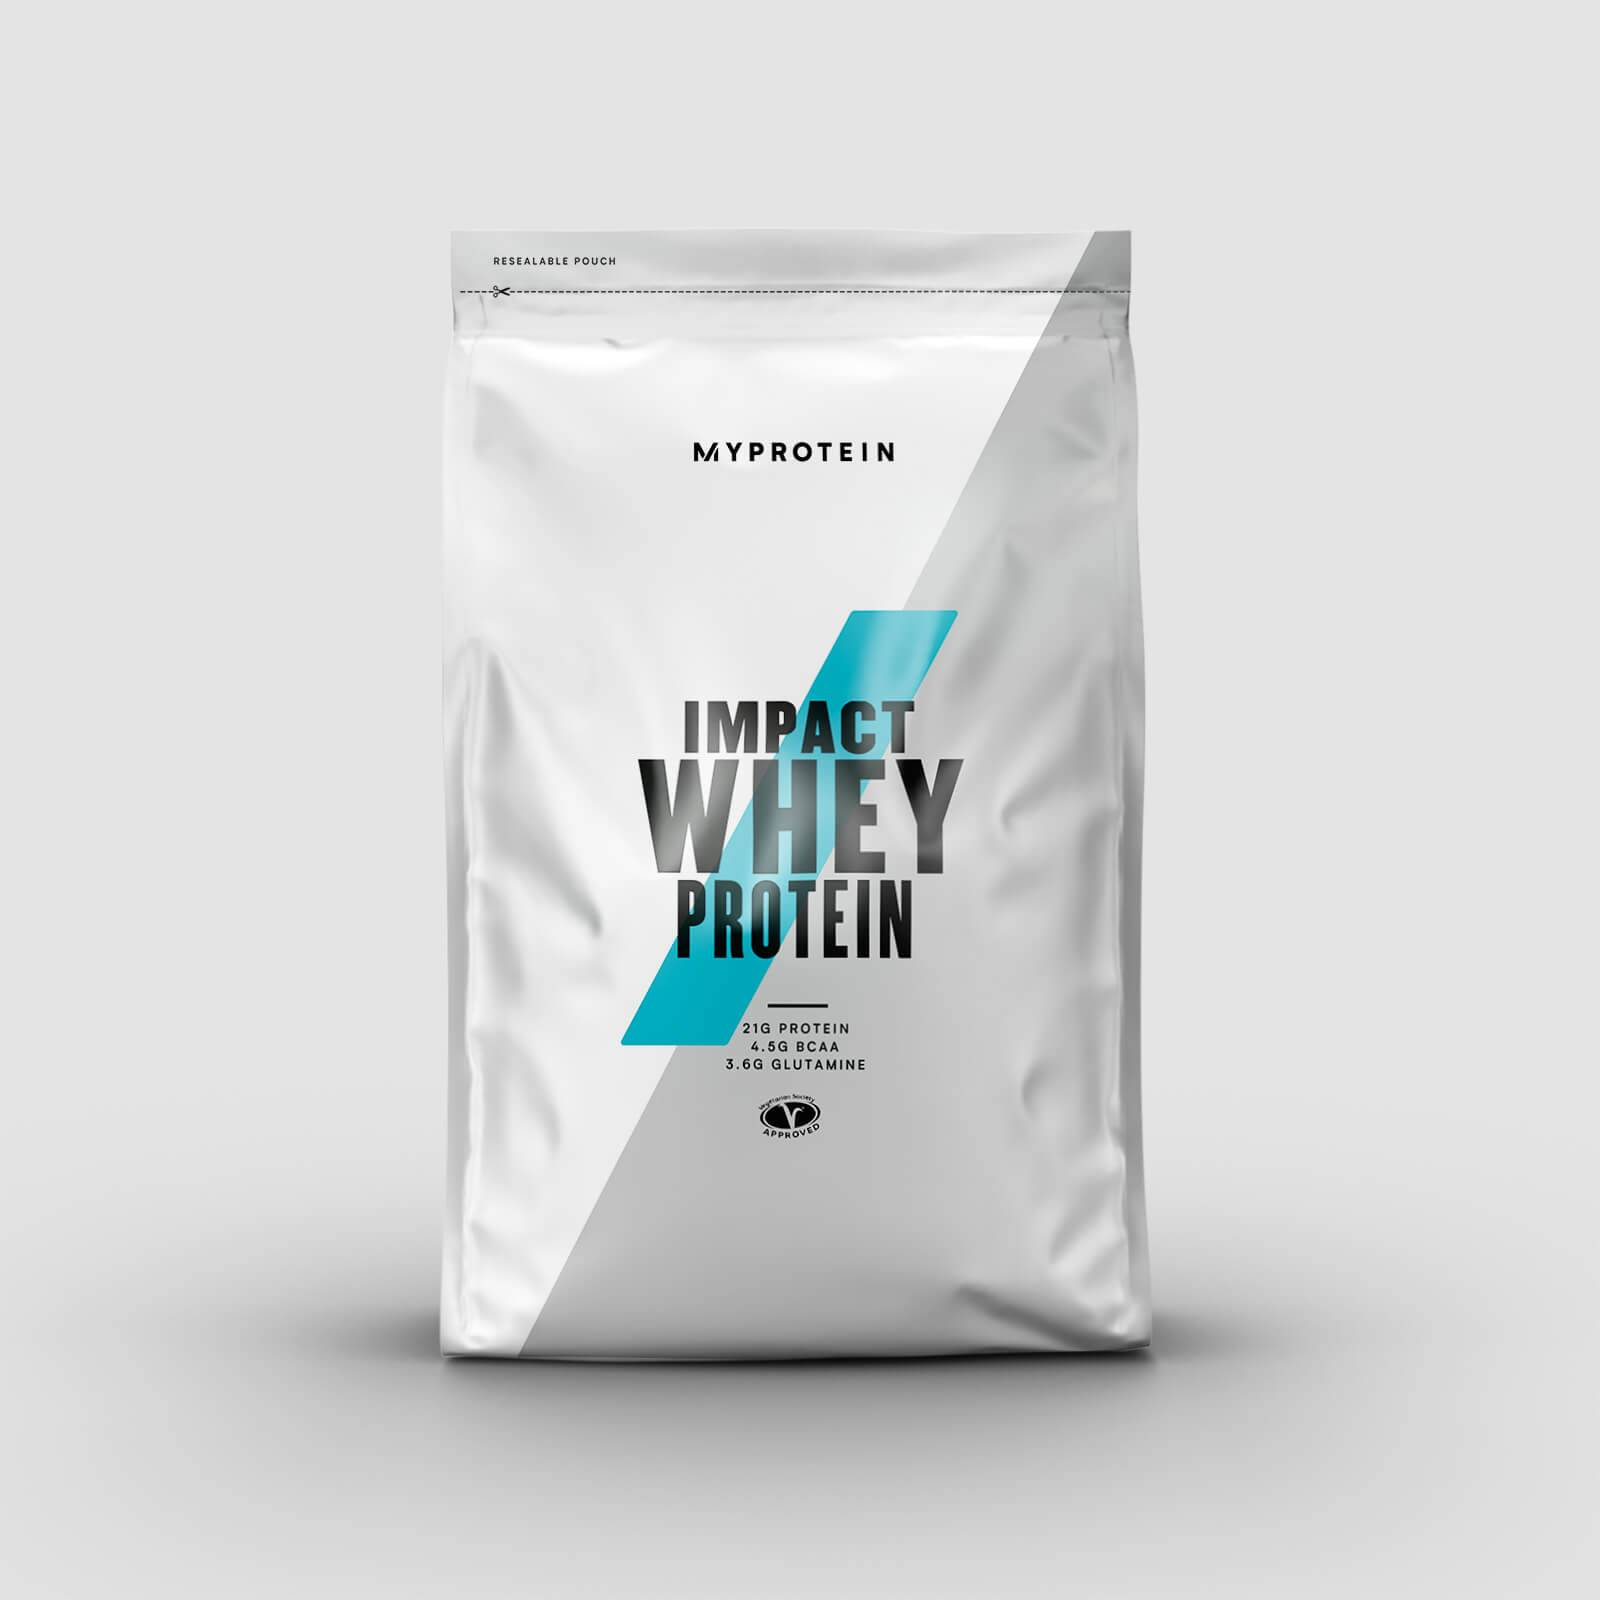 Myprotein Impact Whey Protein - 1kg - Gateau au fromage Myrtille